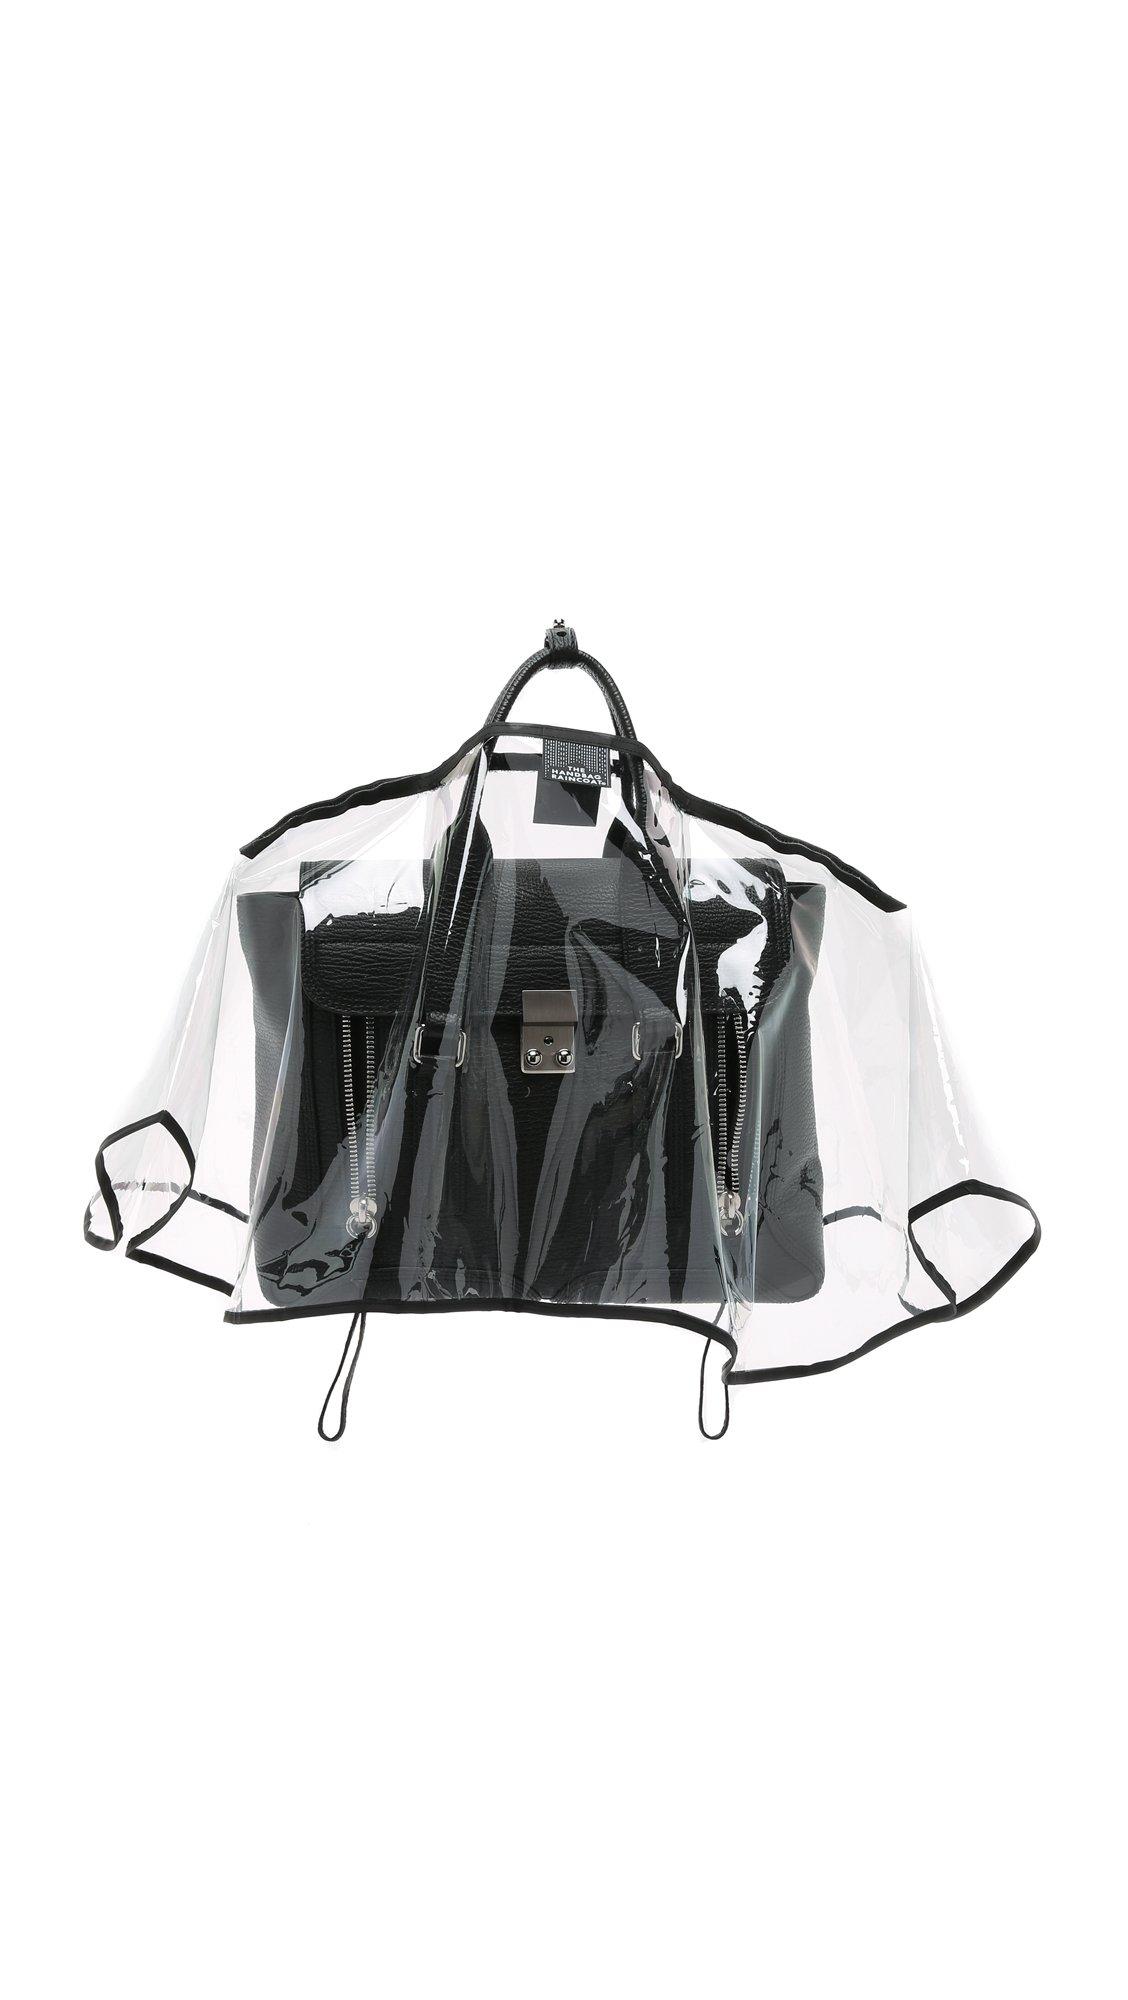 The Handbag Raincoat Women's Medium City Slicker Handbag Raincoat, Clear/Black, One Size